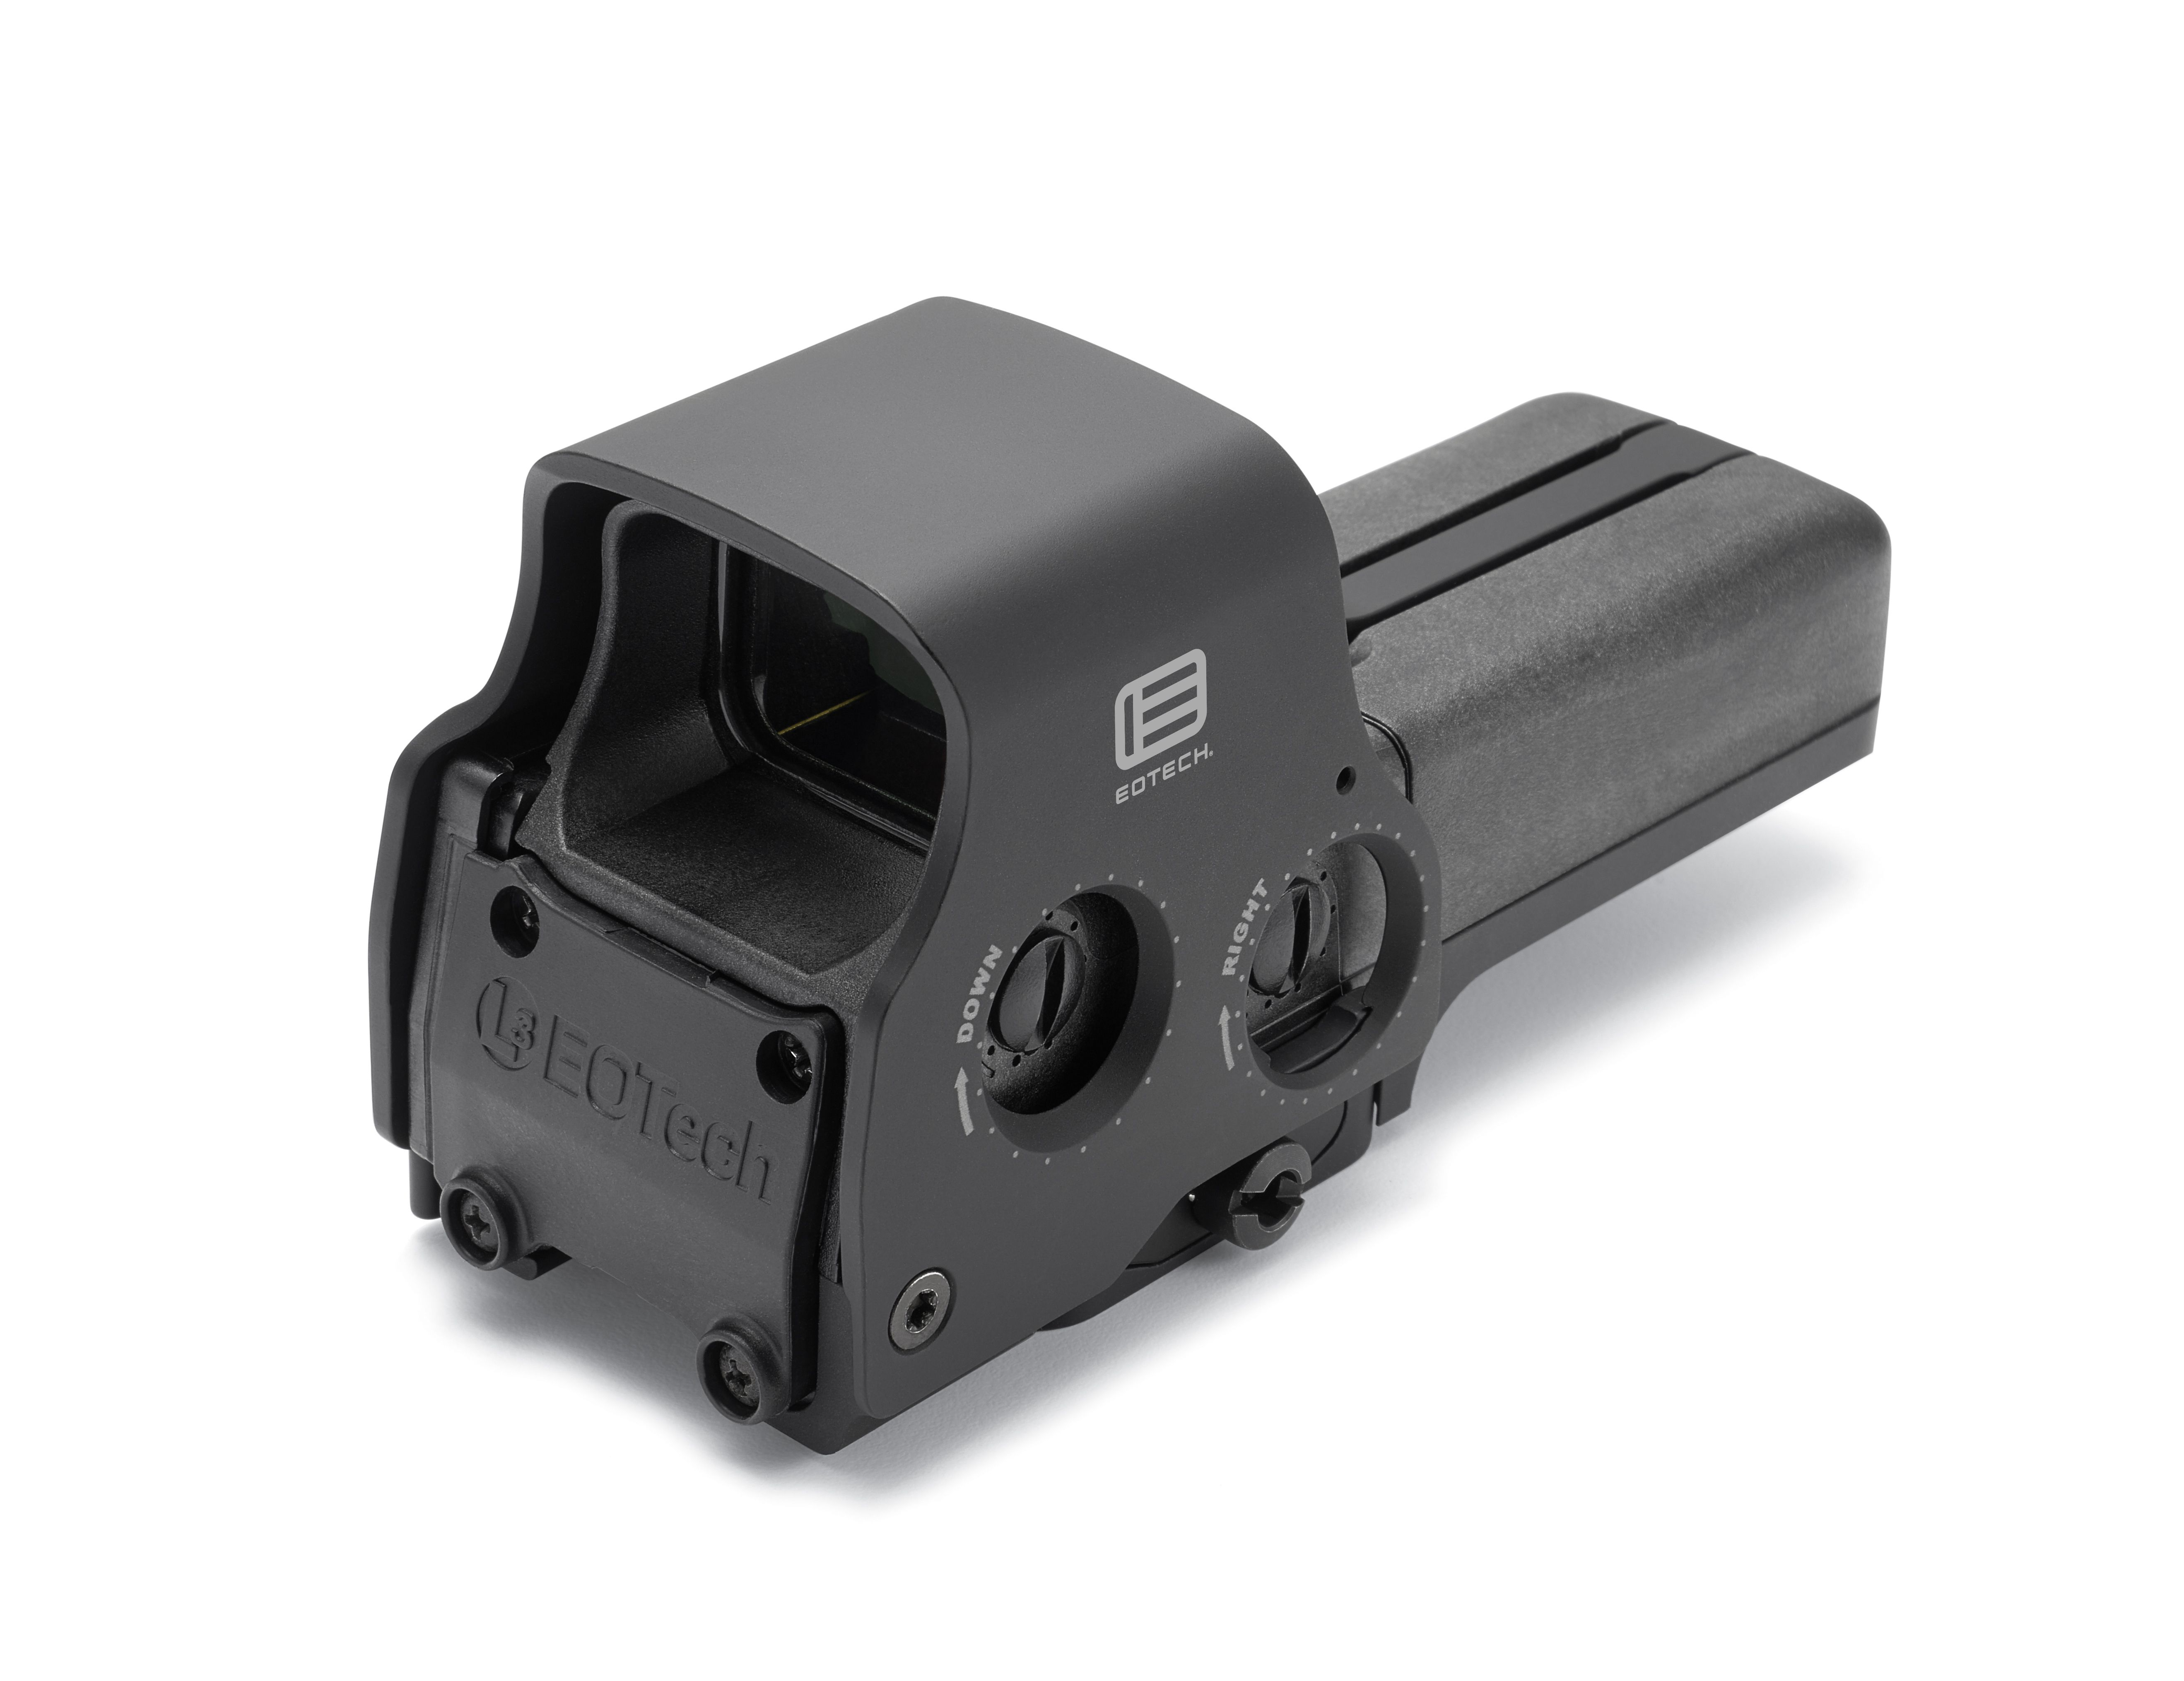 Deals & Discounts on premium optics for hobbies and work like riflescopes, binoculars, night vision, telescopes, sunglasses & microscopes.